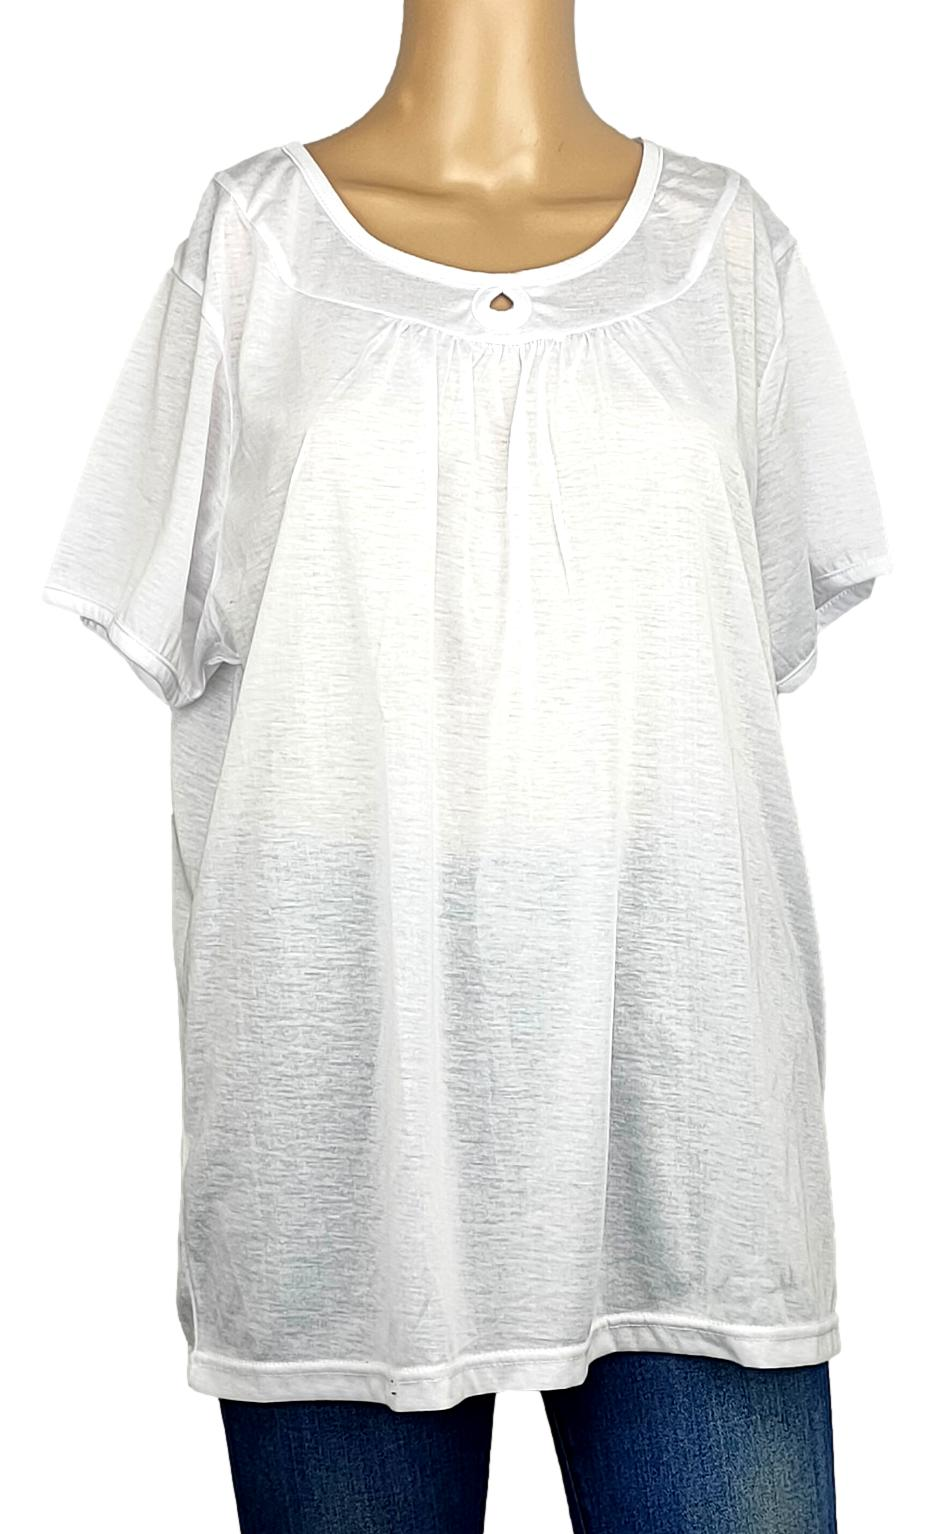 T-shirt Sans marque - Taille XL